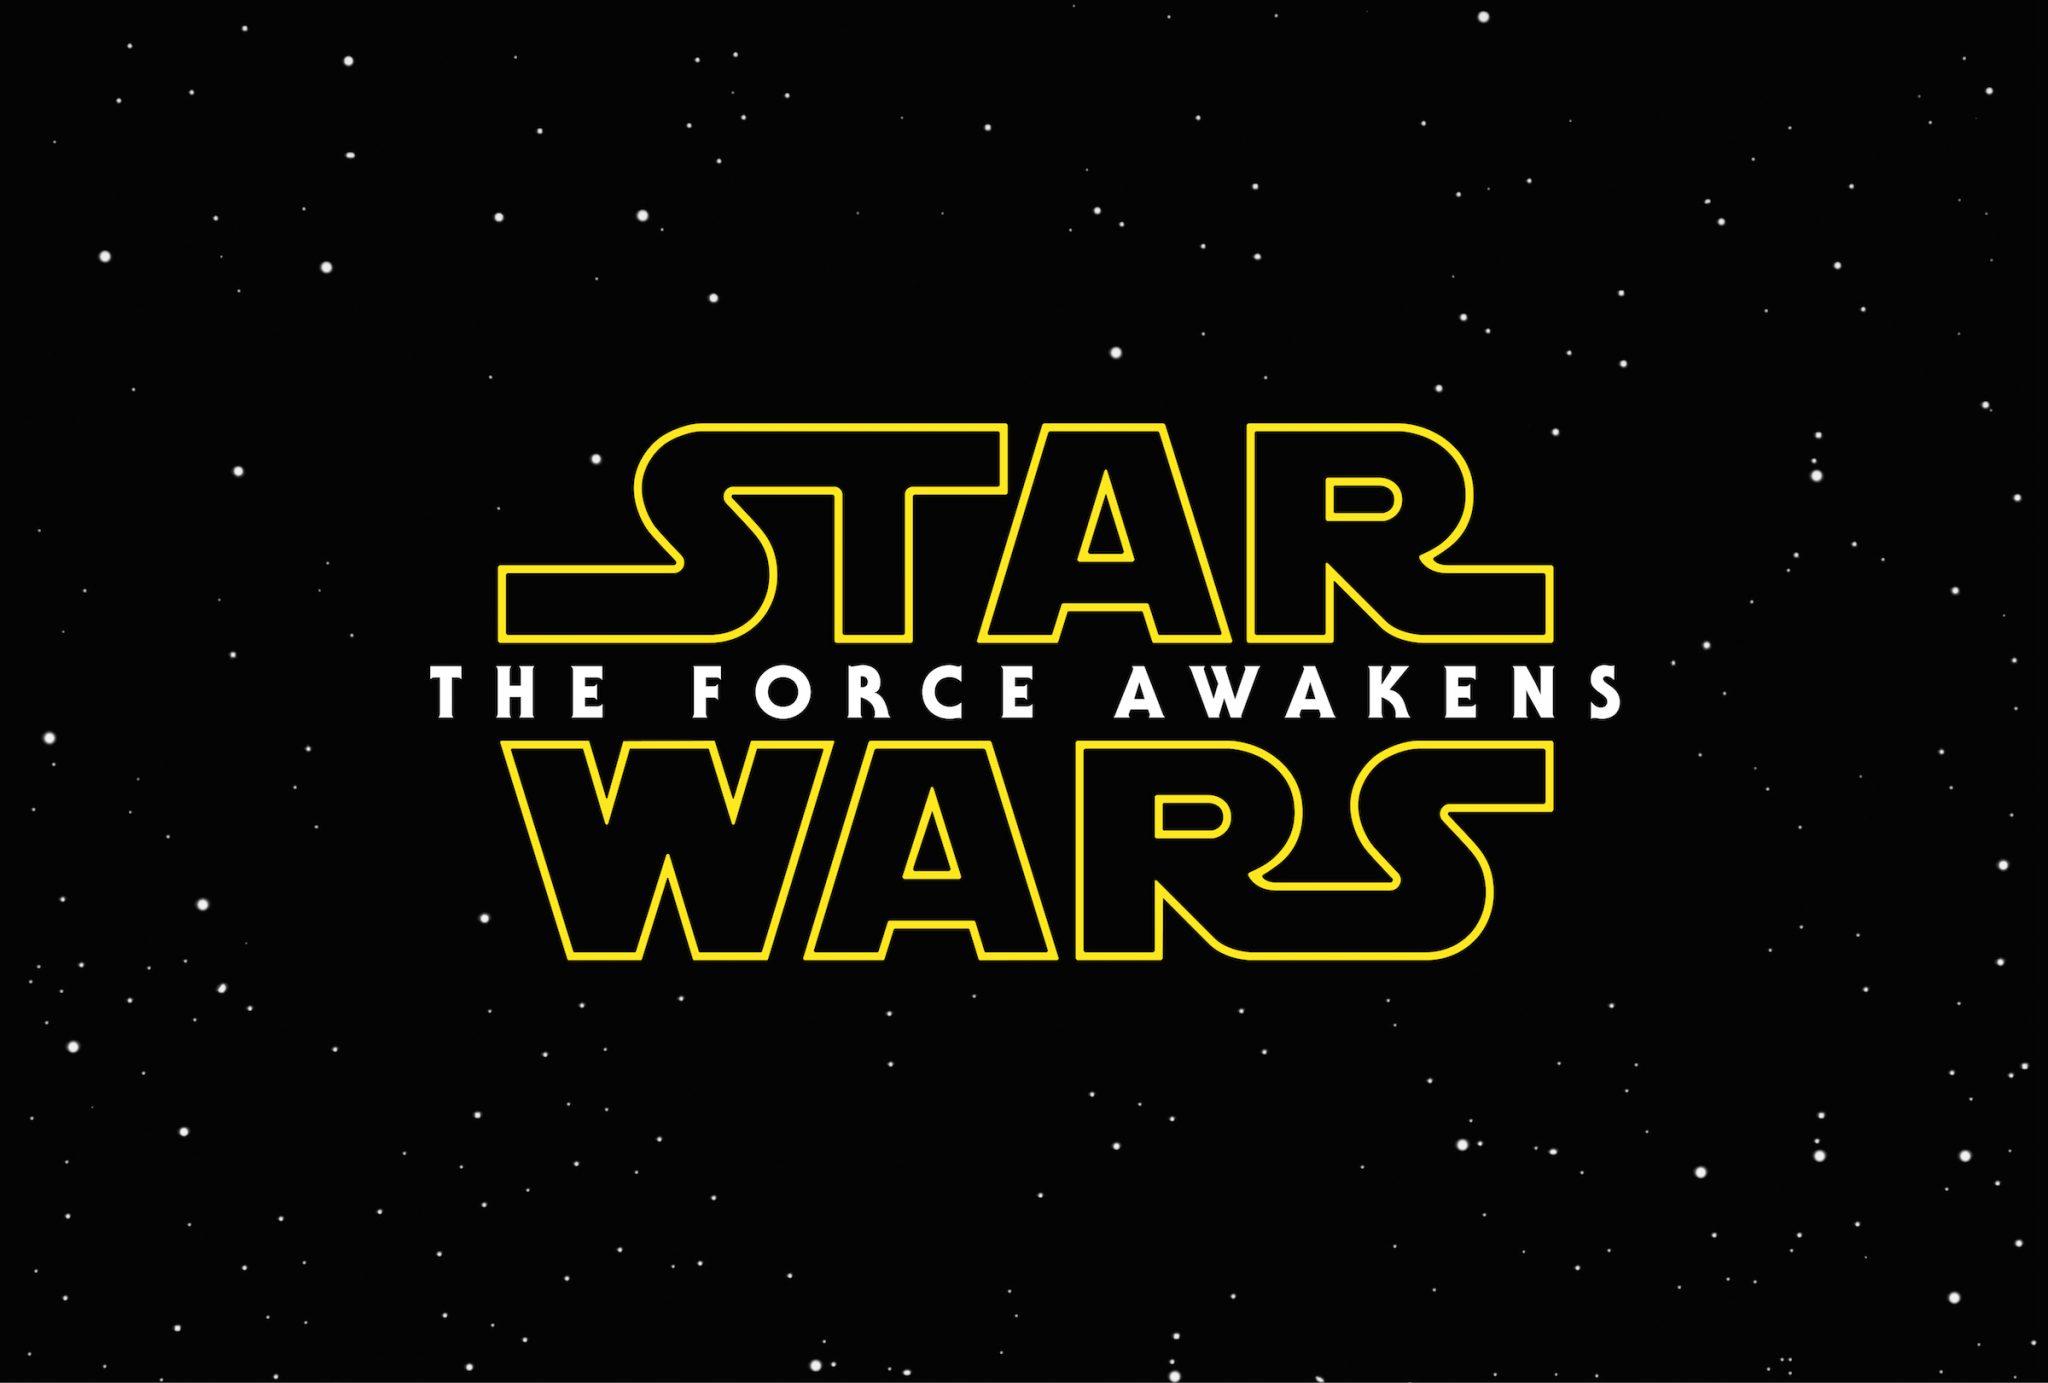 NEW STAR WARS TRAILER!